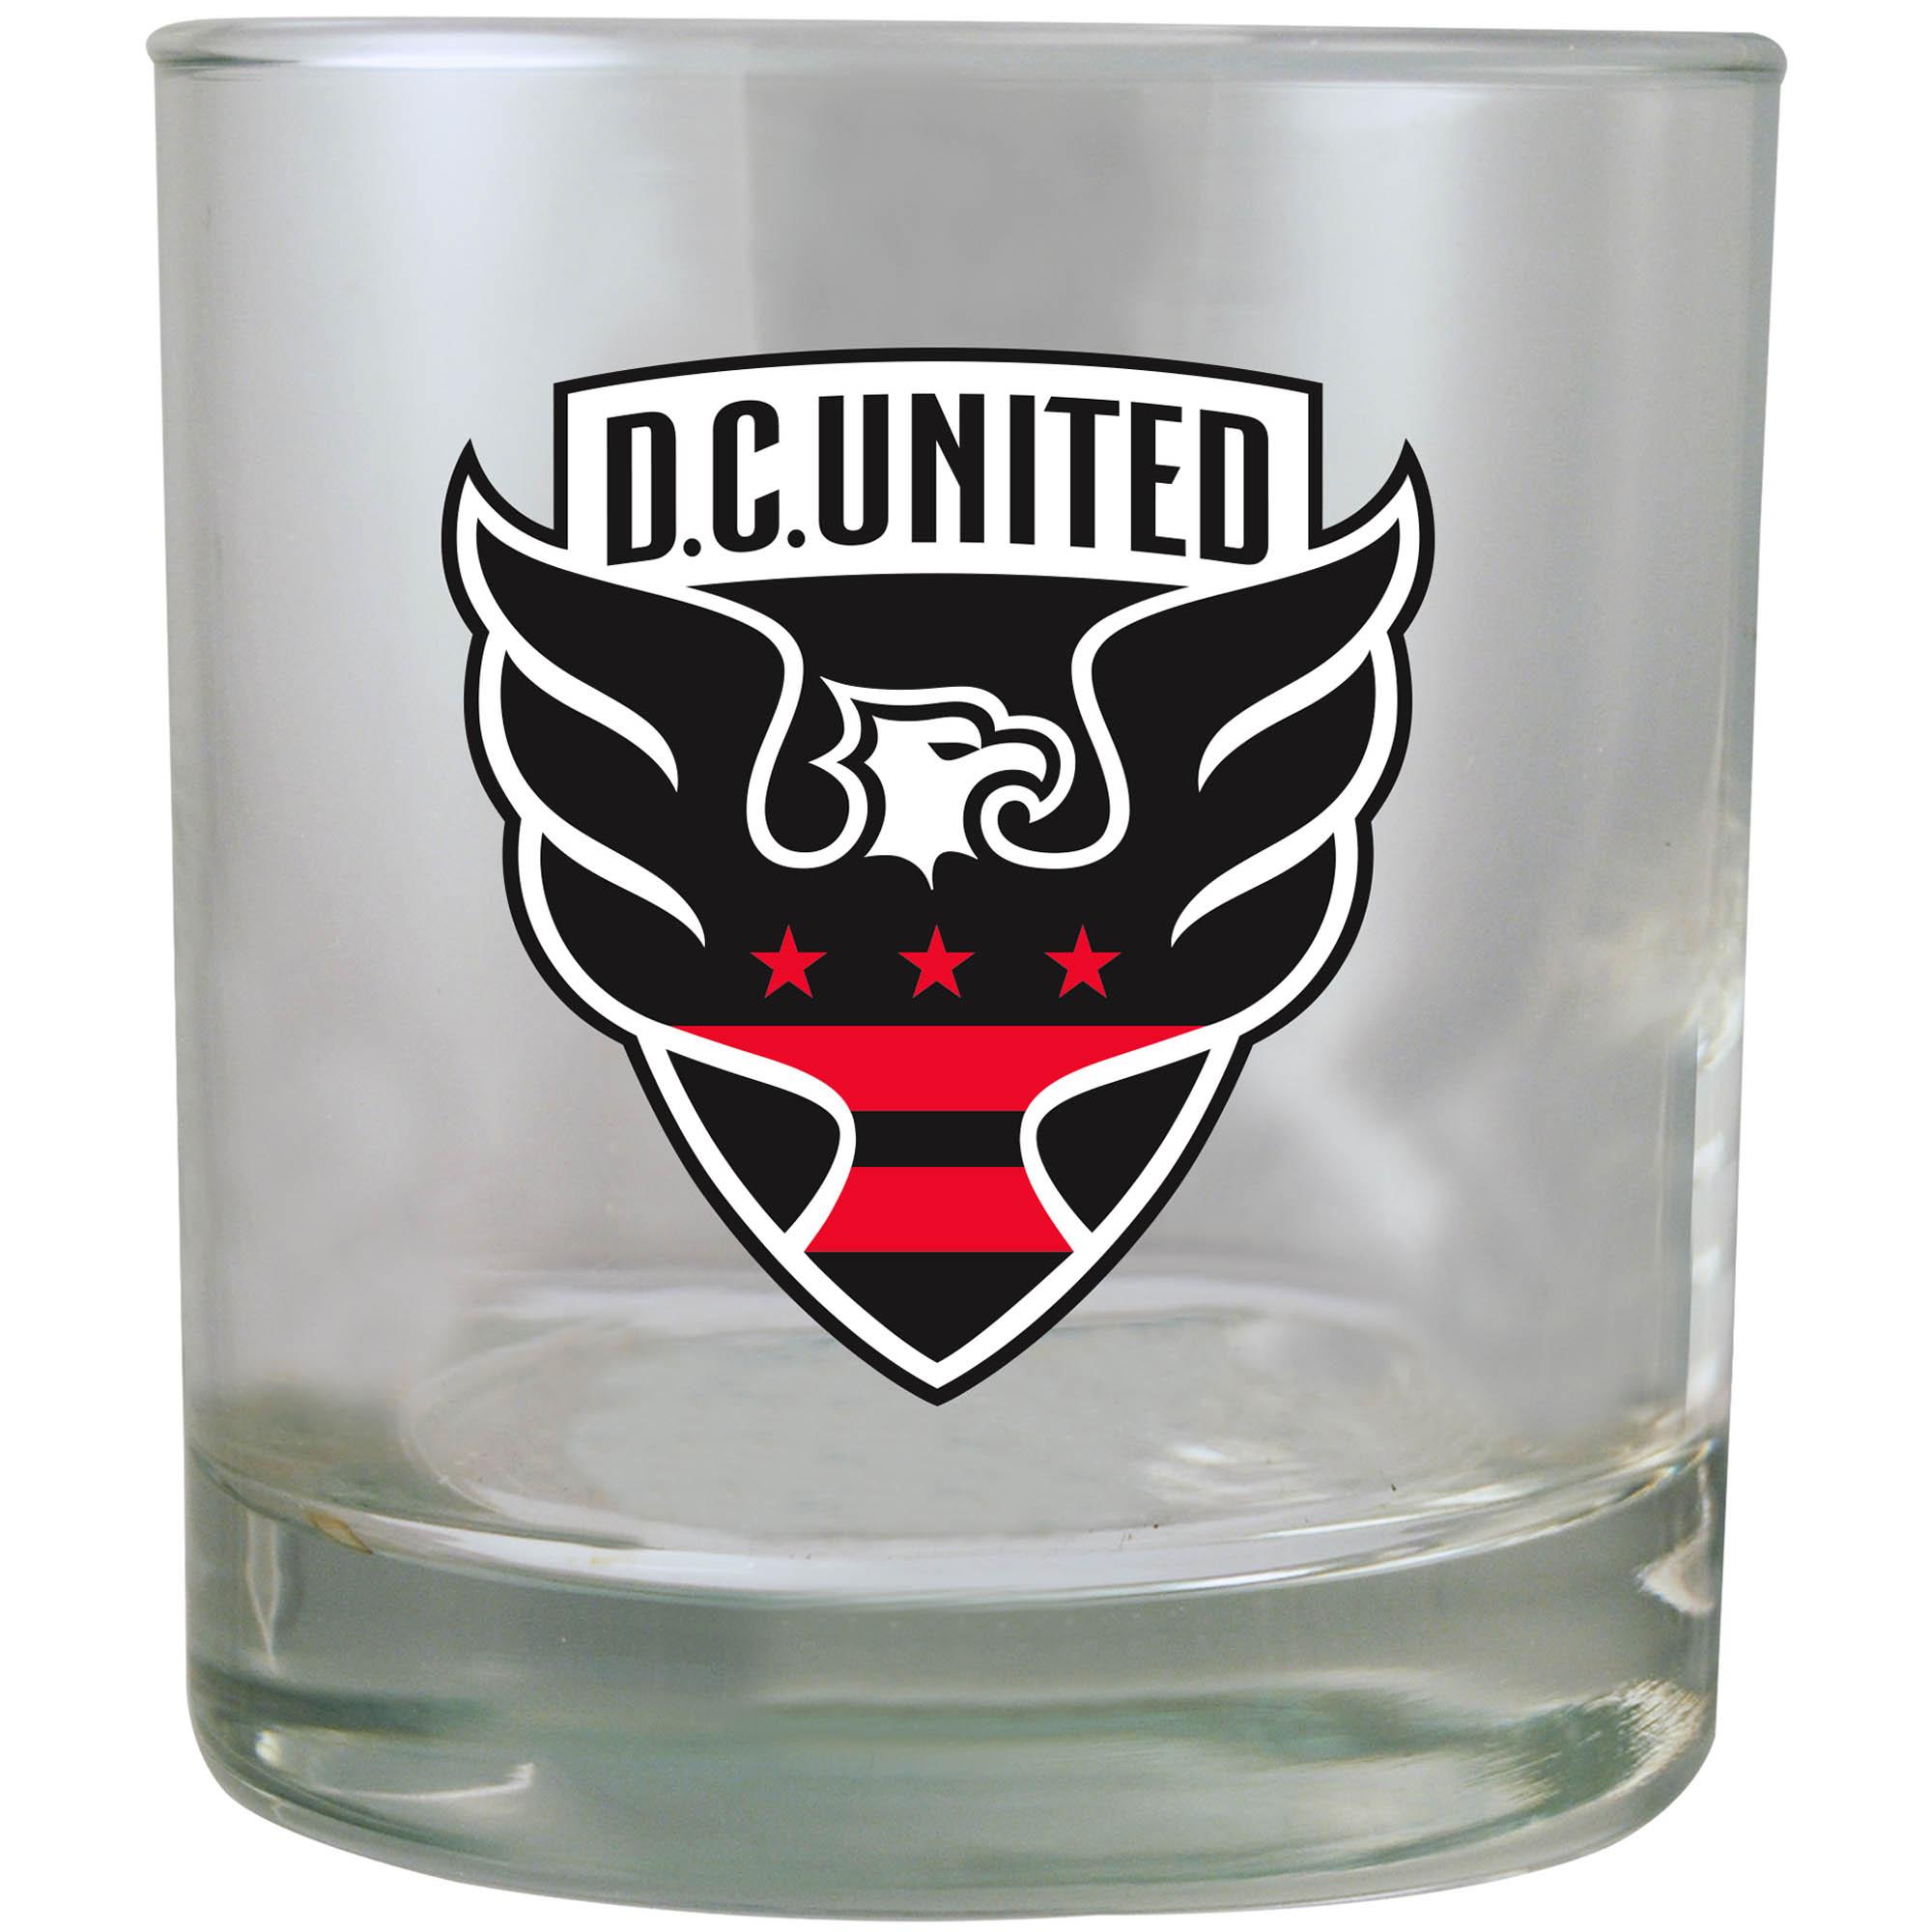 D.C. United 8.45oz. Rocks Glass - No Size